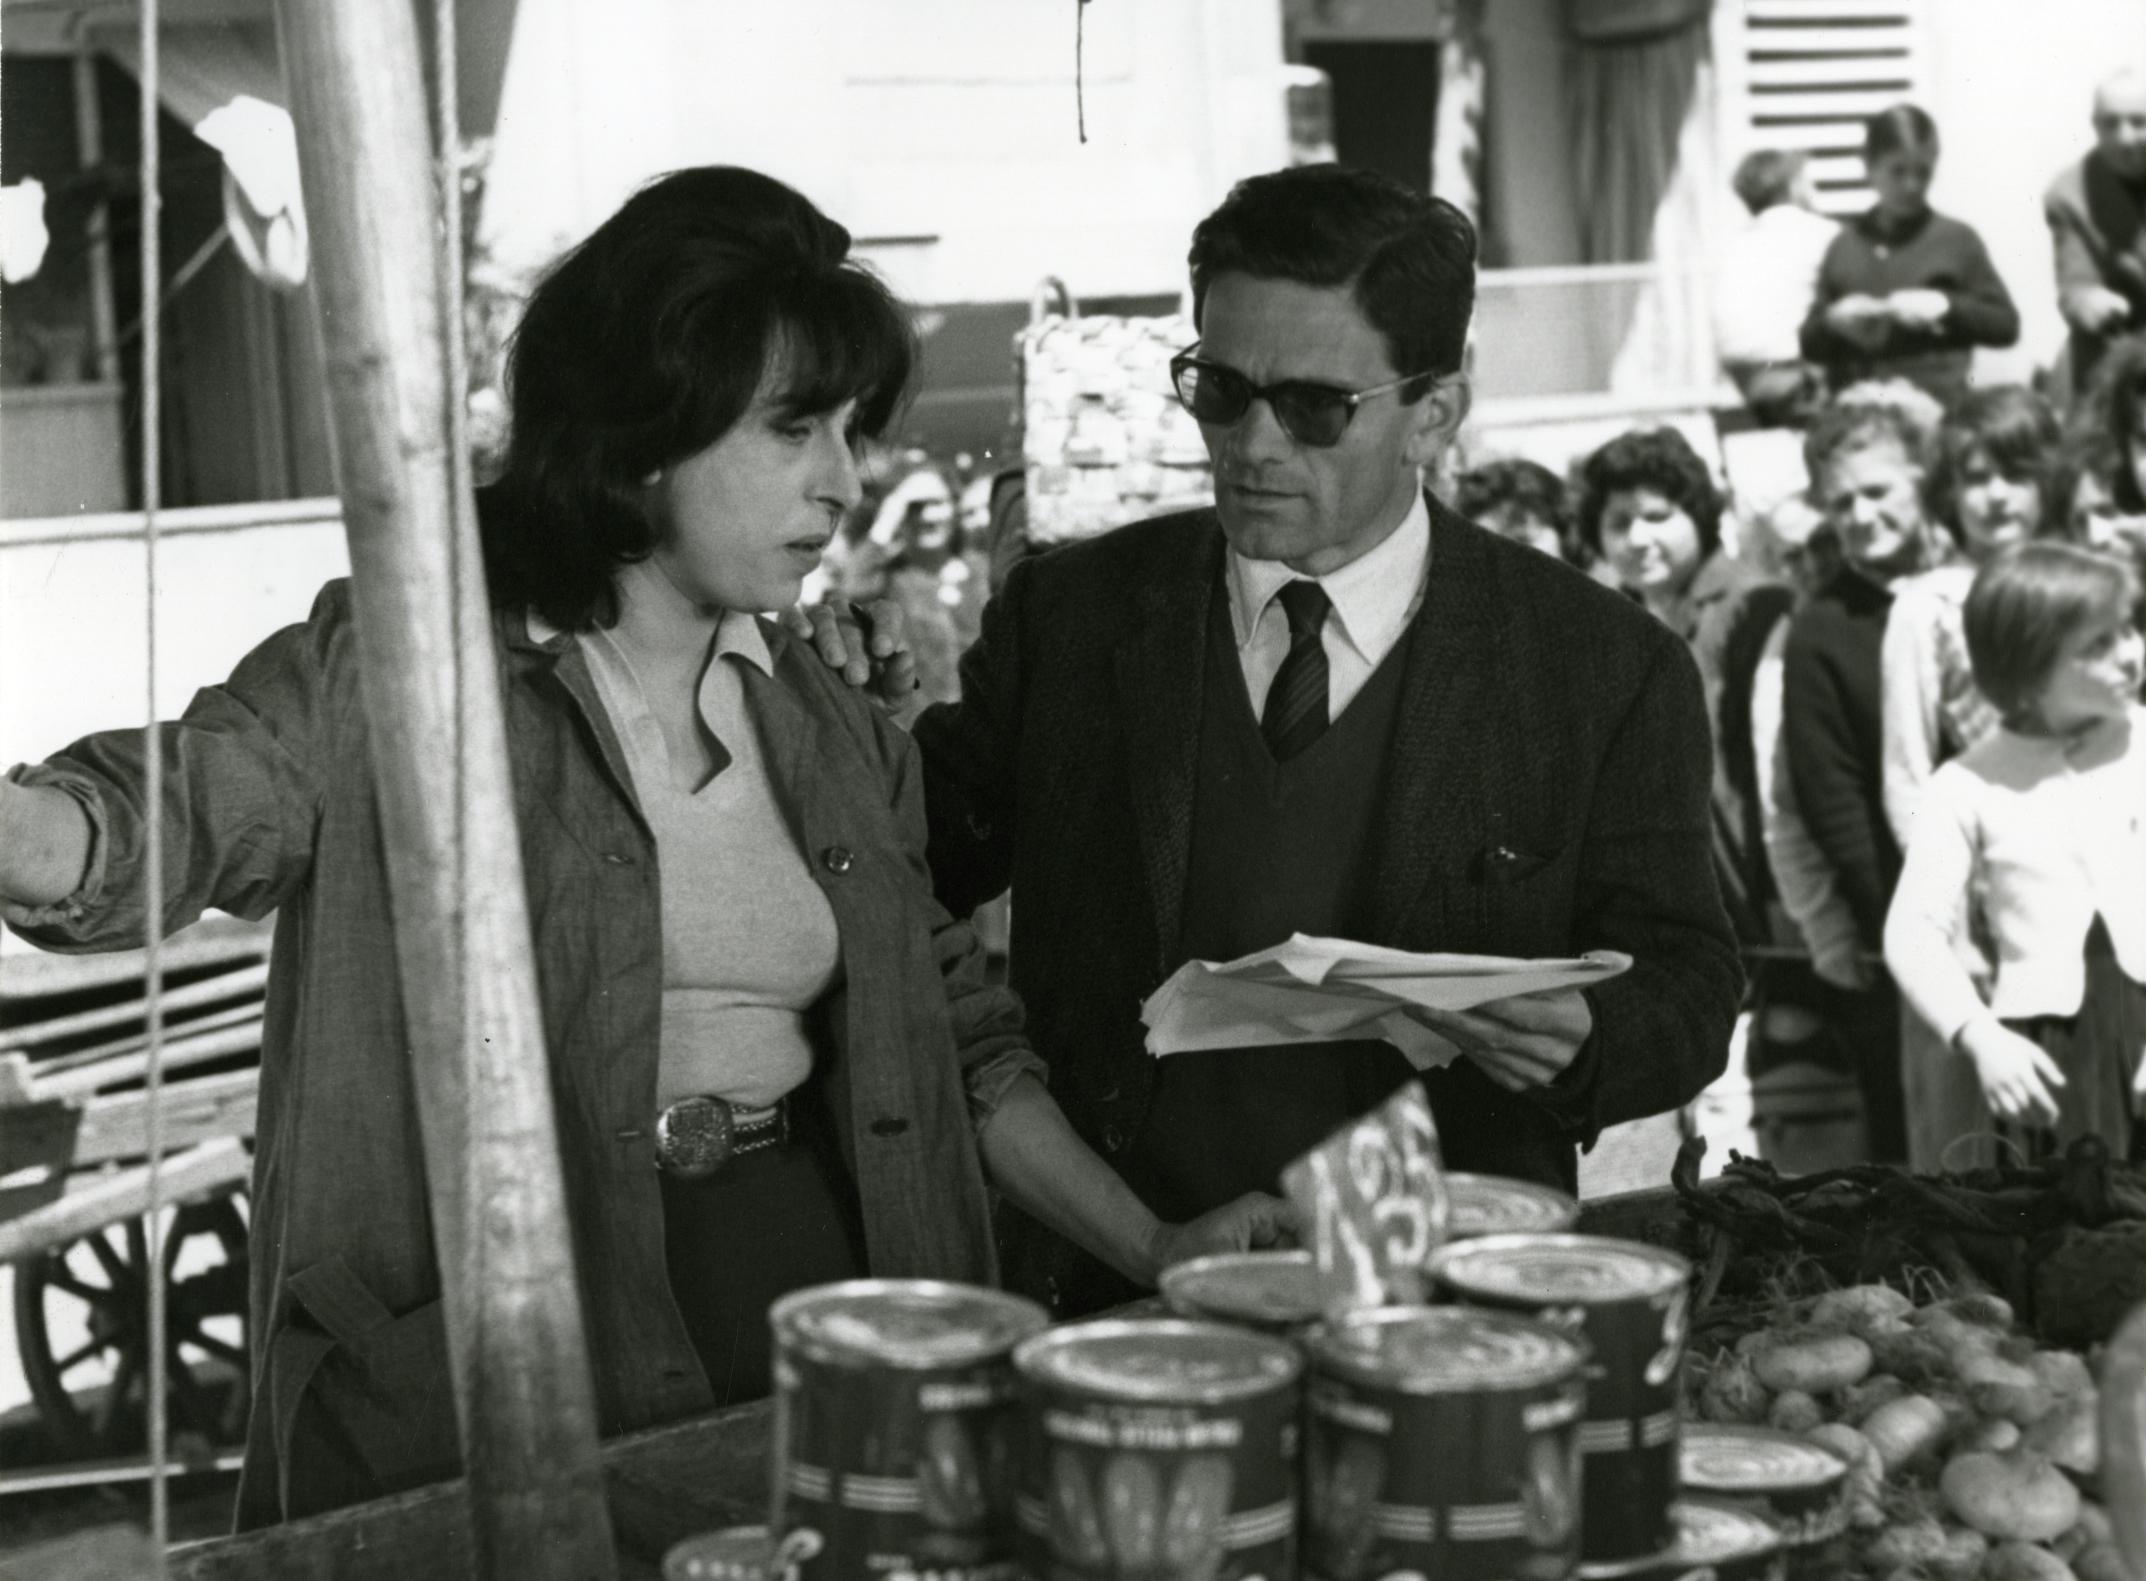 Mamma Roma (Pier Paolo Pasolini), photographie de tournage